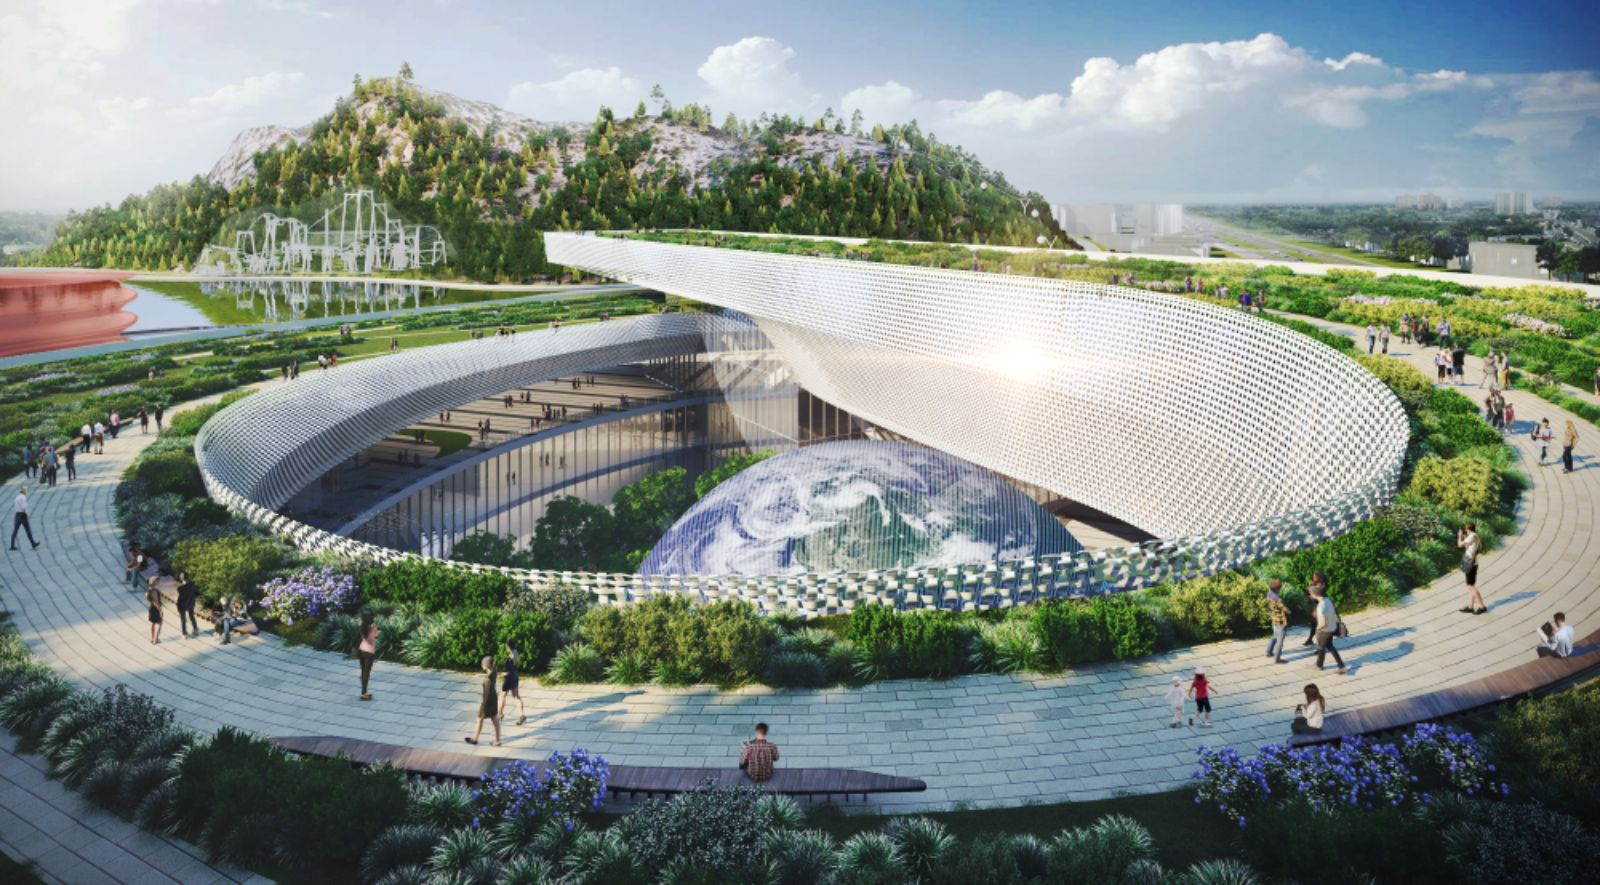 Suzhou Science & Technology Museum